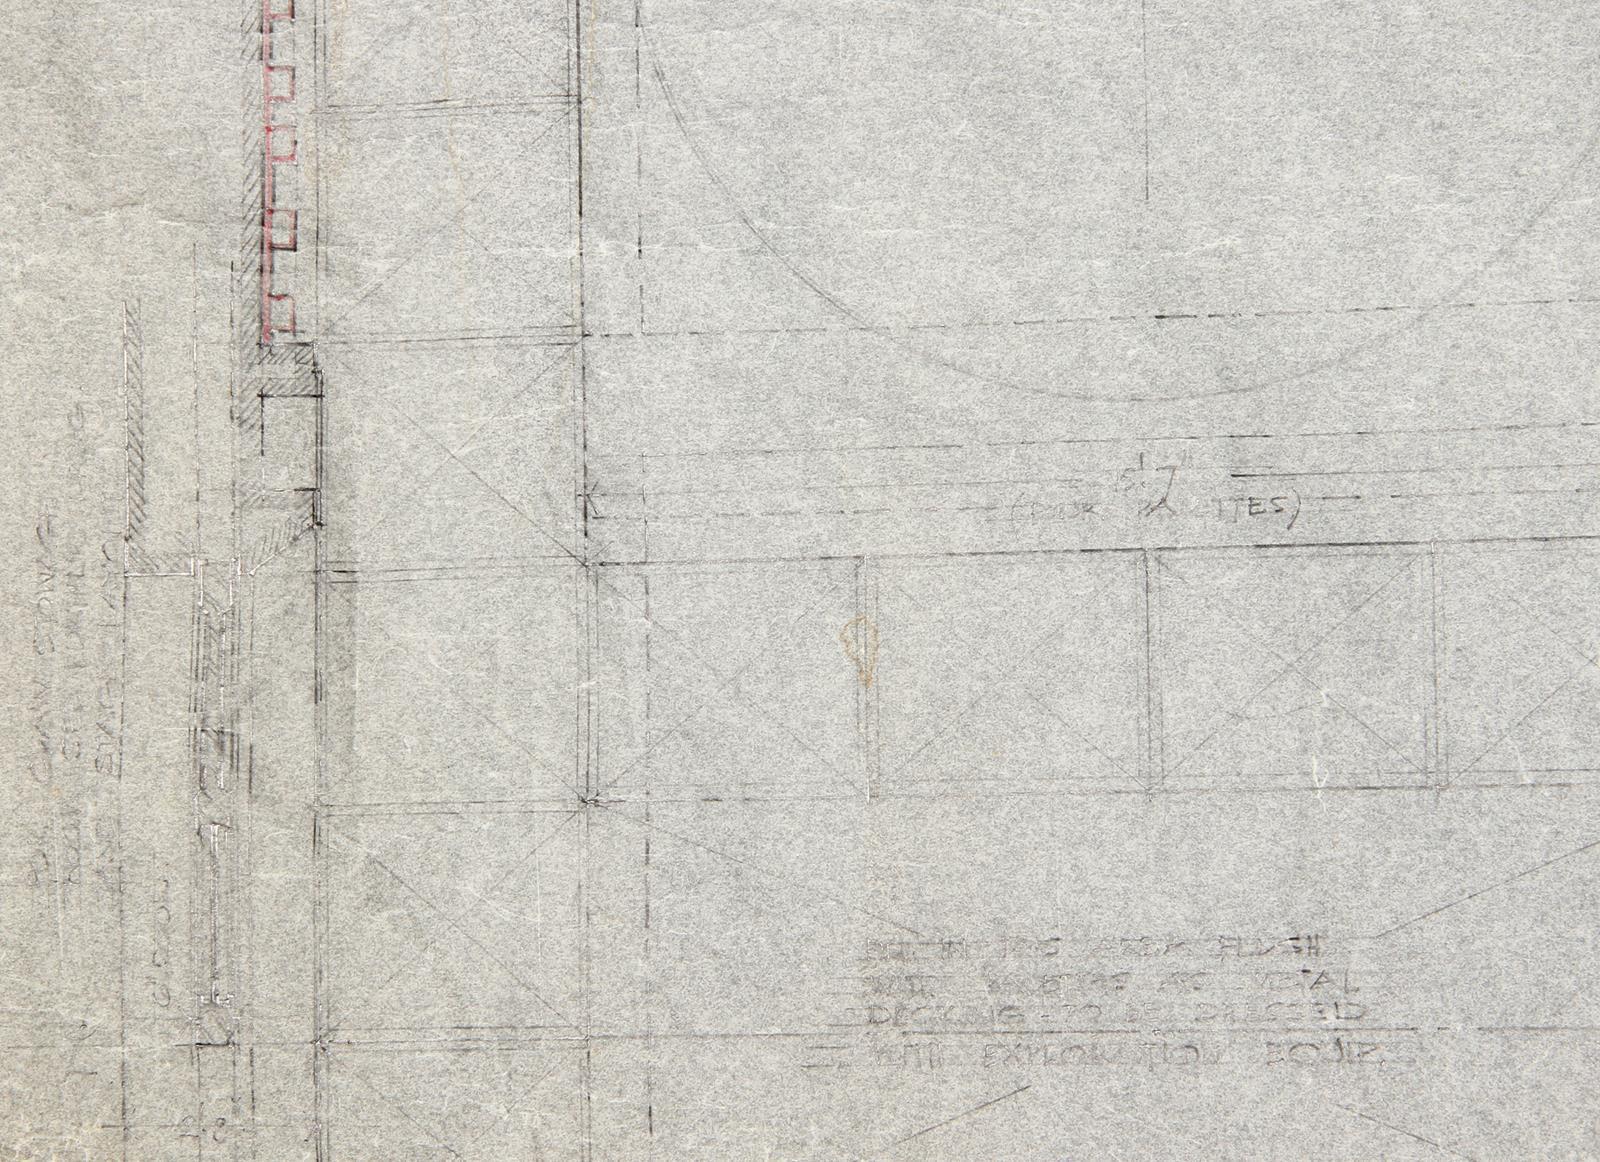 ALIEN (1979) - Hand-Drawn Nostromo Hangar Pencil Illustration A hand-drawn pencil set illustration - Image 8 of 11